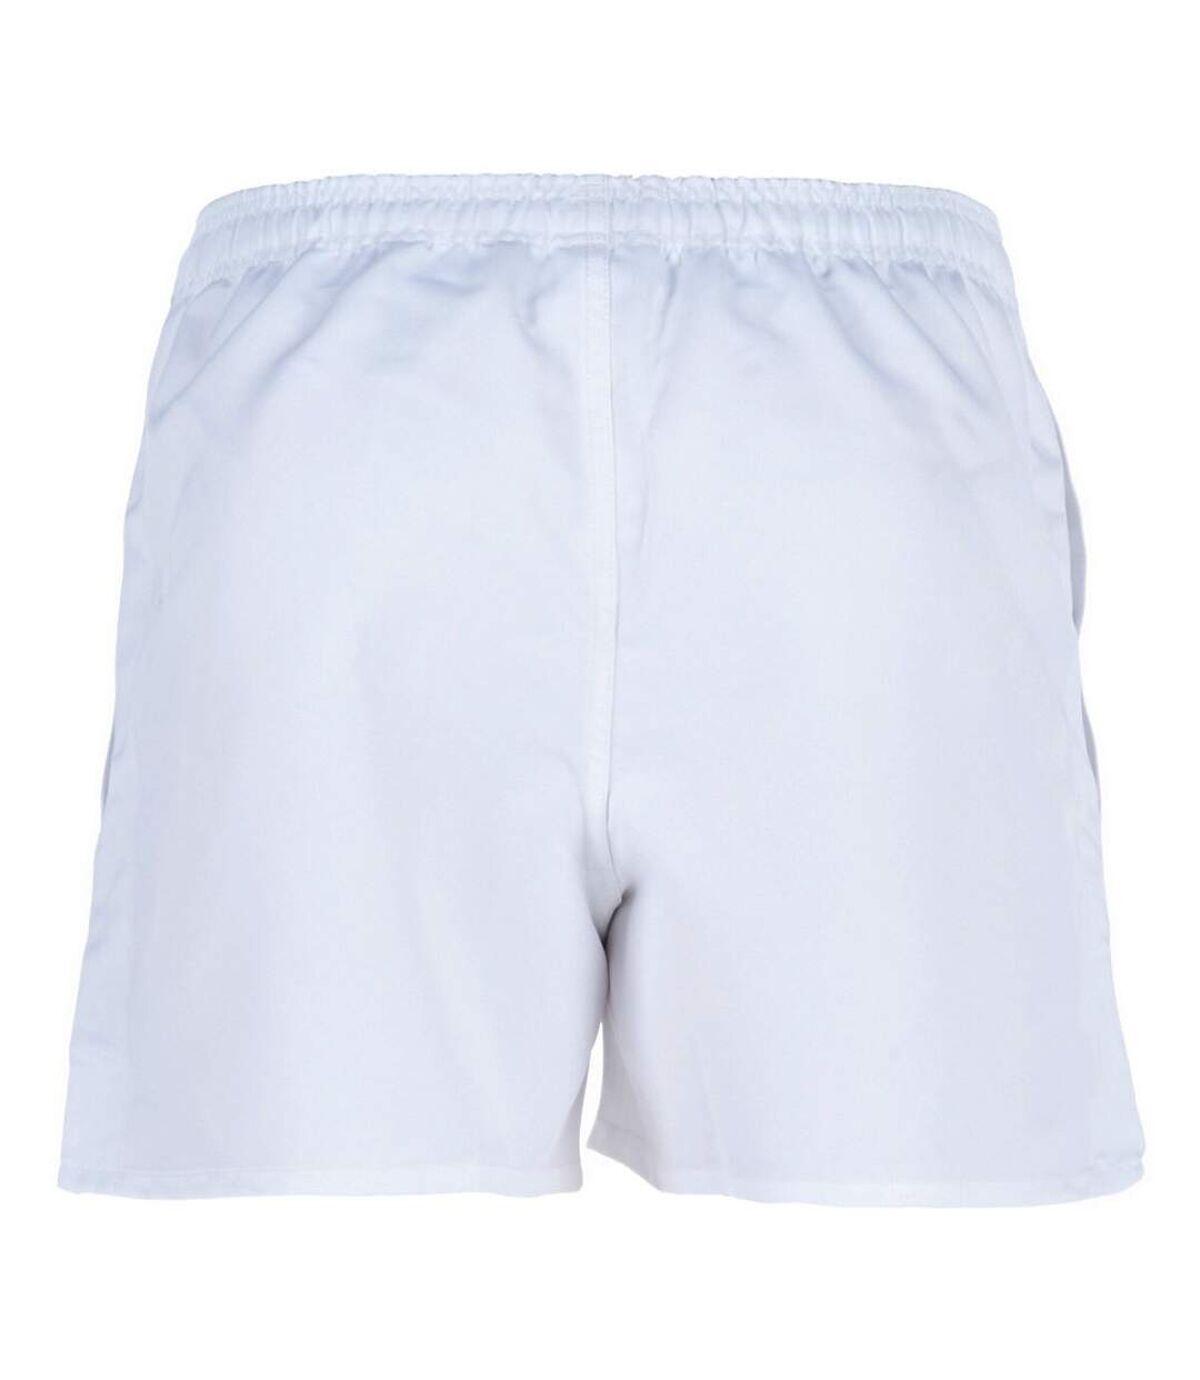 Canterbury Mens Professional Elasticated Sports Shorts (White) - UTPC2493